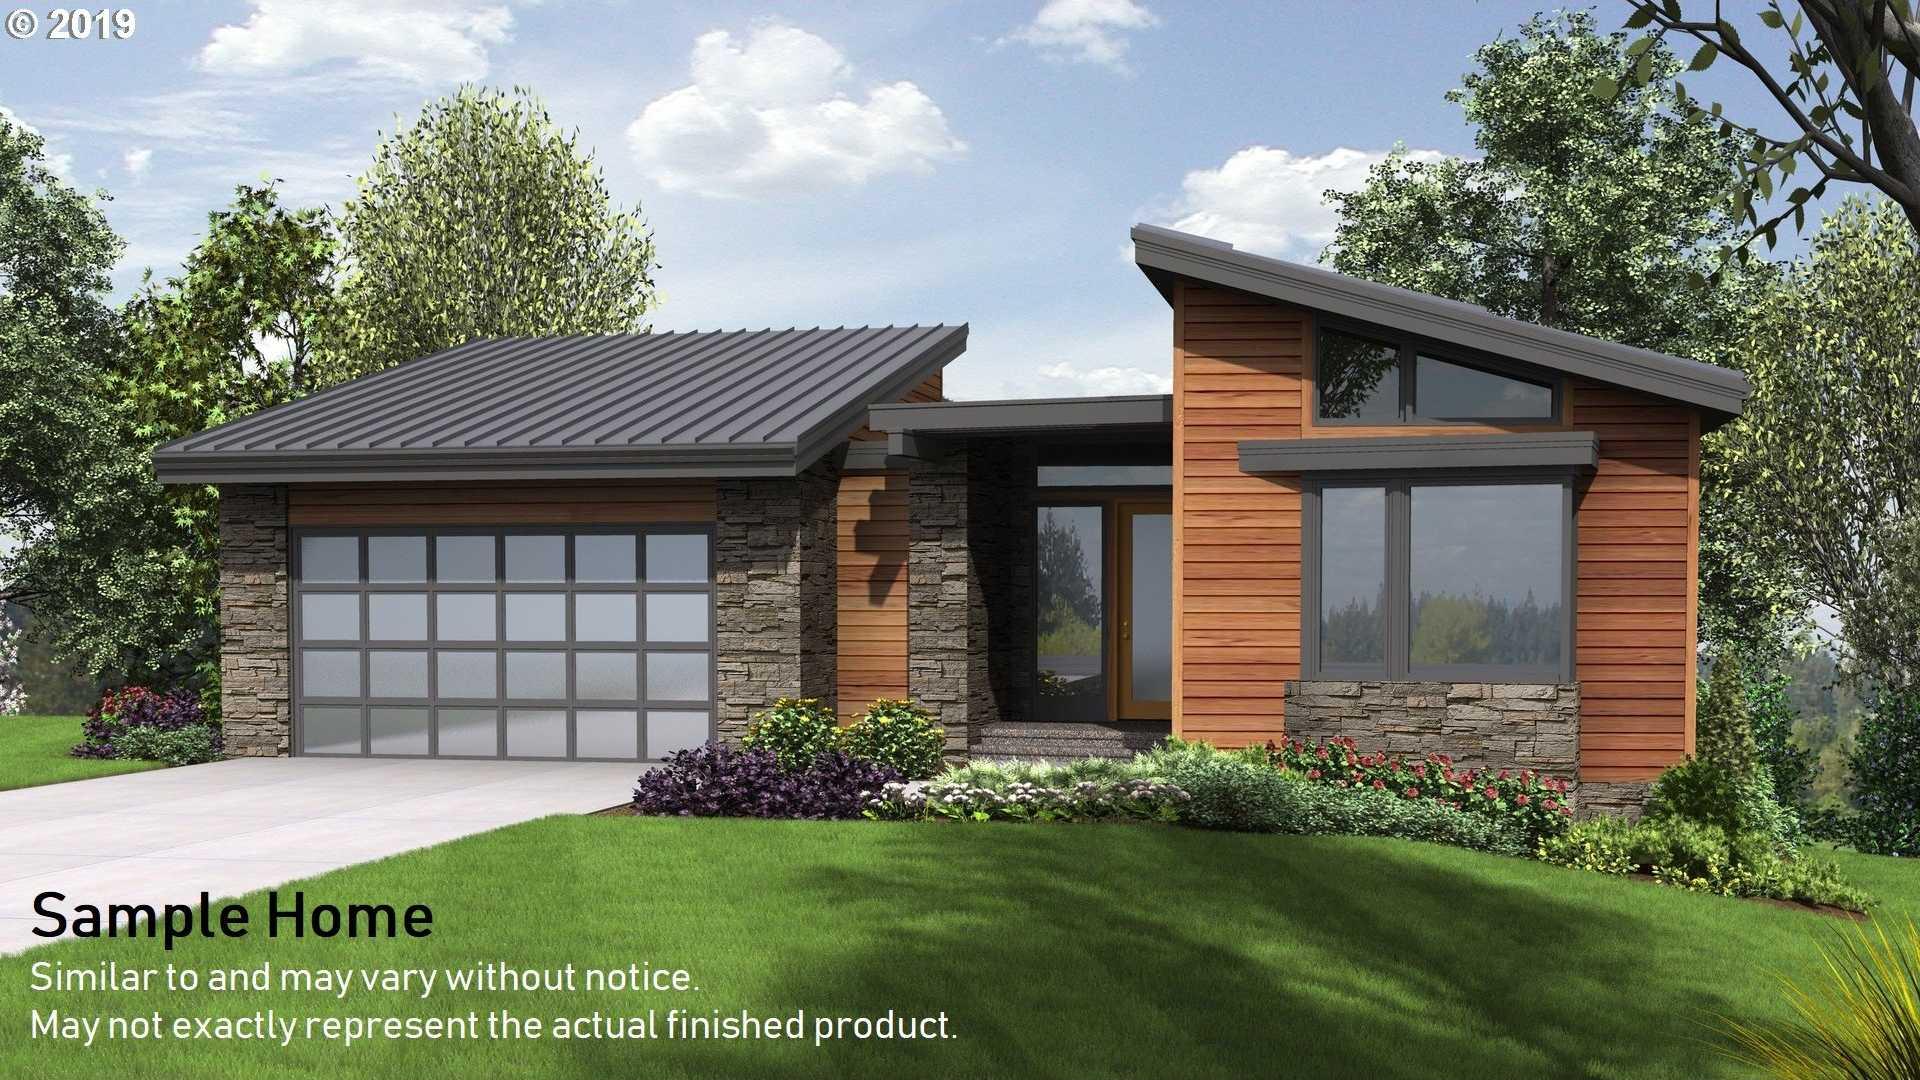 $1,119,500 - 4Br/4Ba -  for Sale in Kleier View Estates, Hillsboro